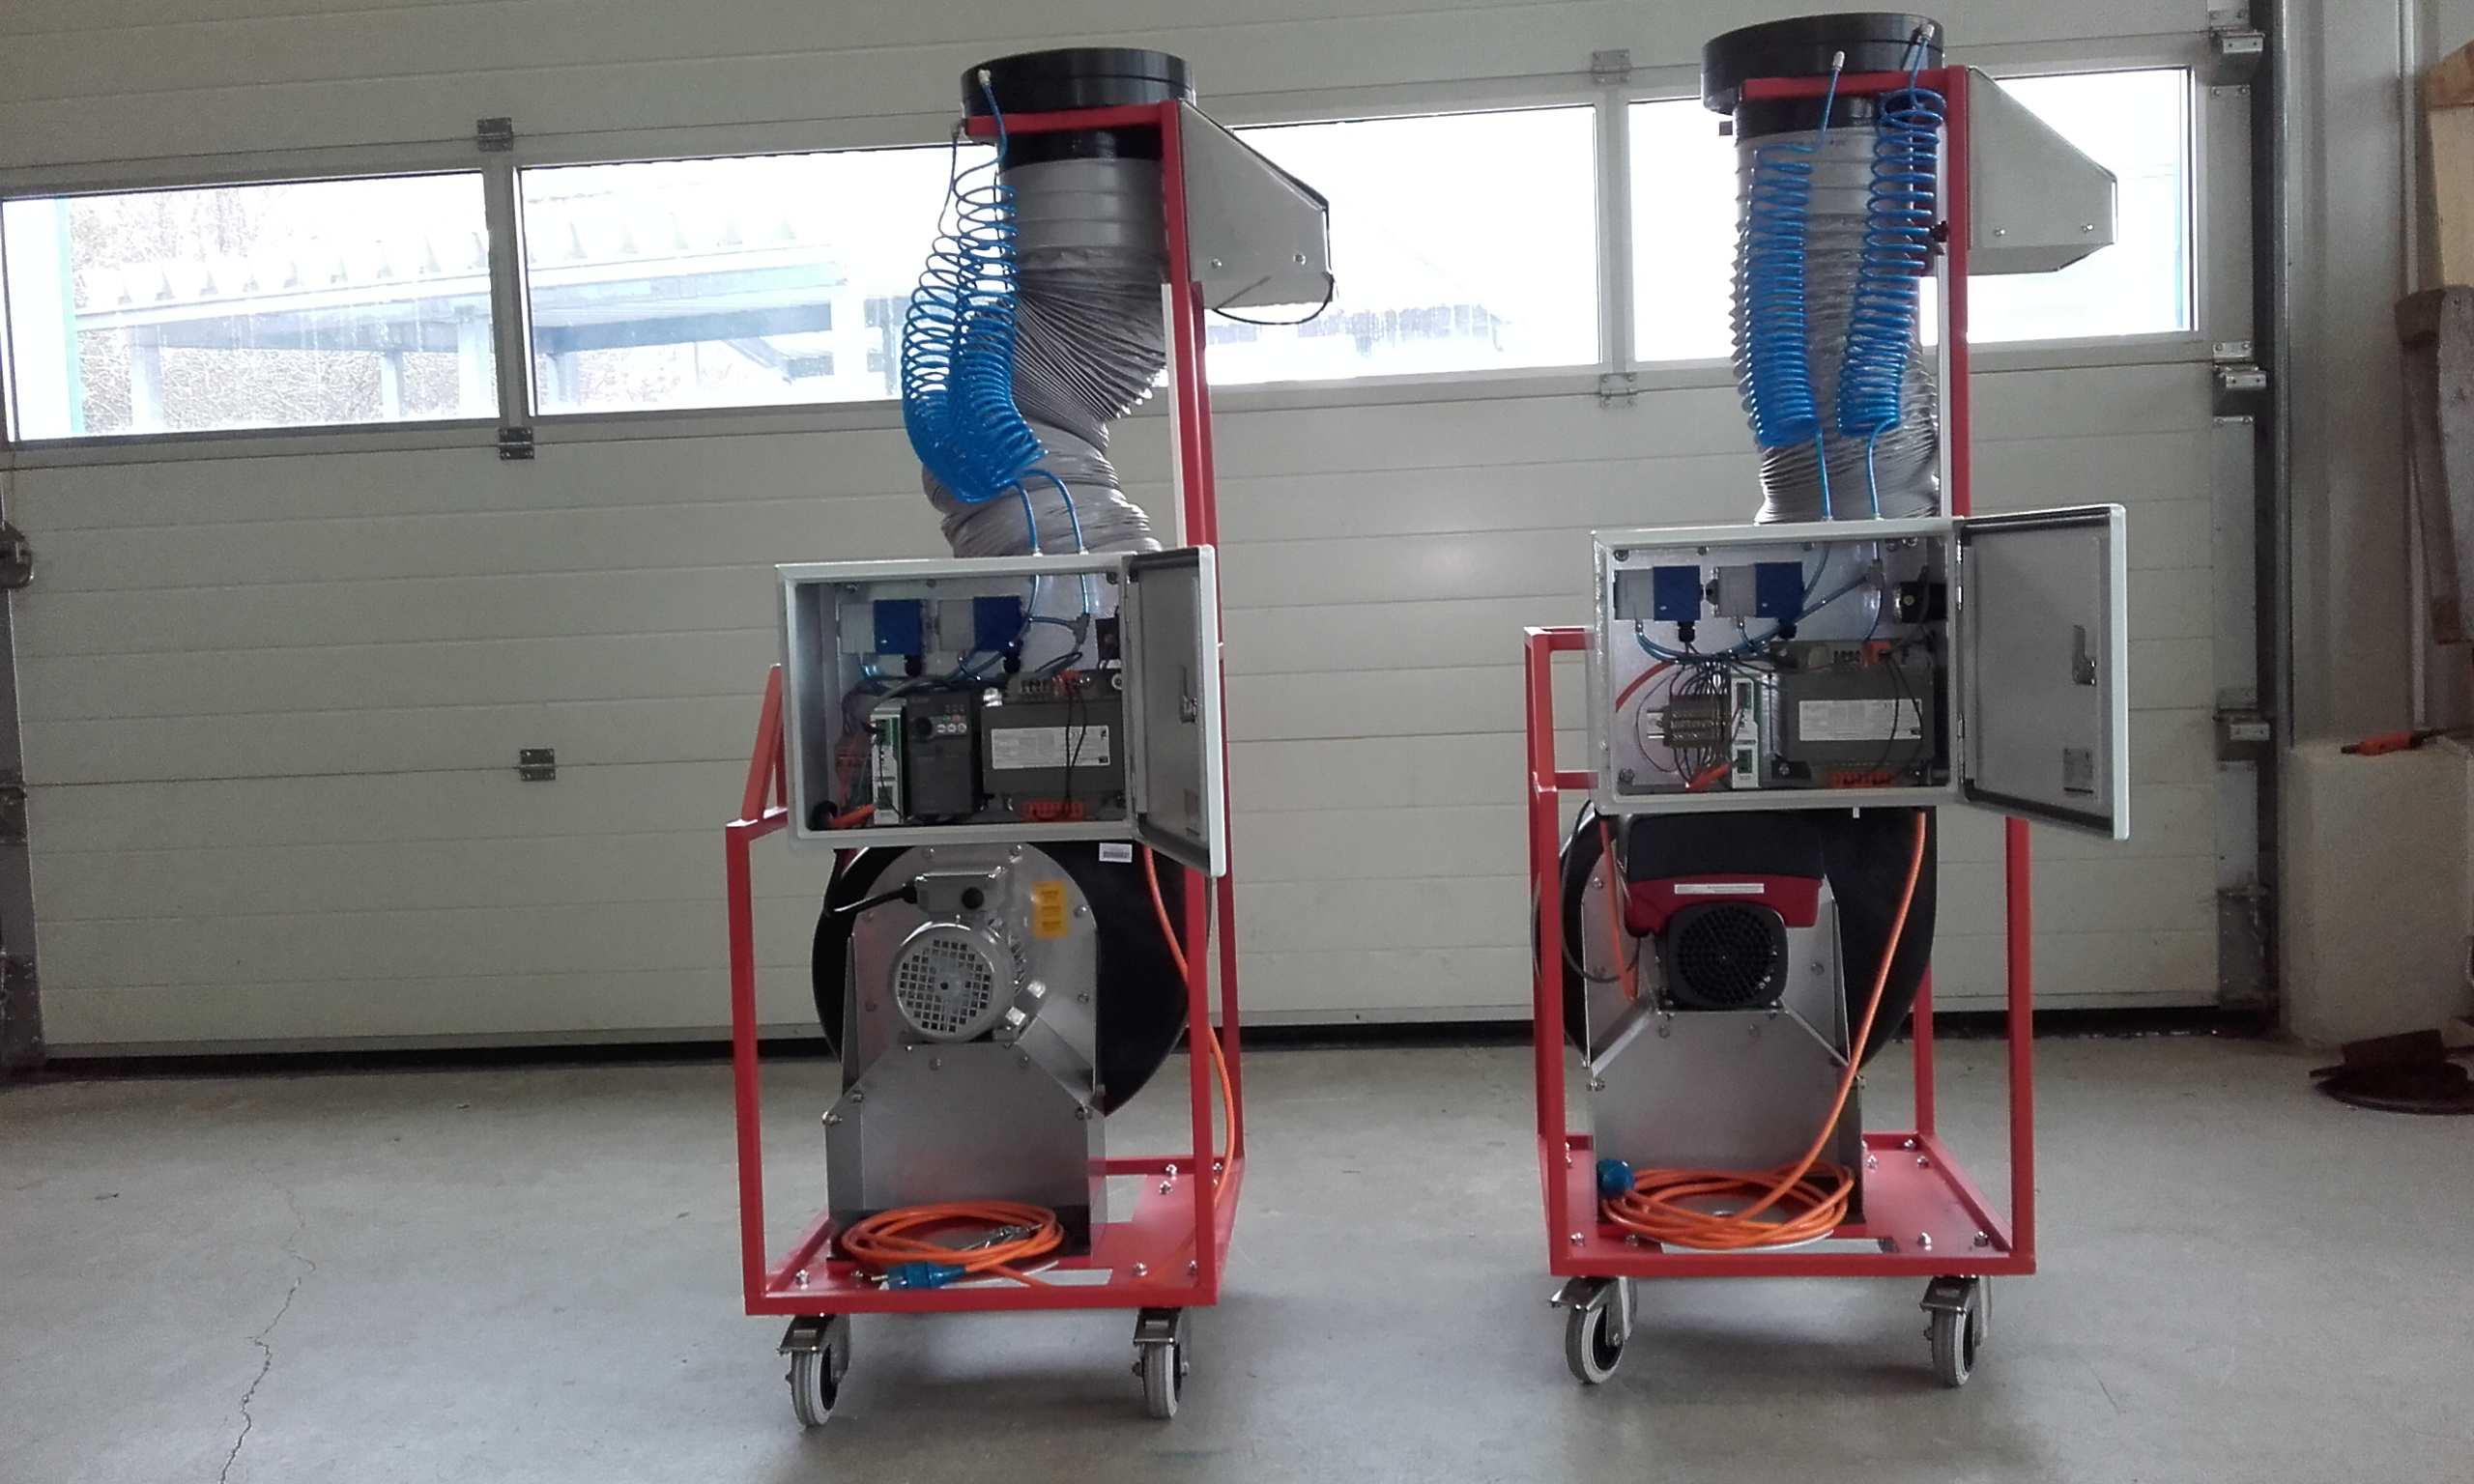 BLM-3-R4.1和BLM-3-R4.2车身漏风量测试仪的区别